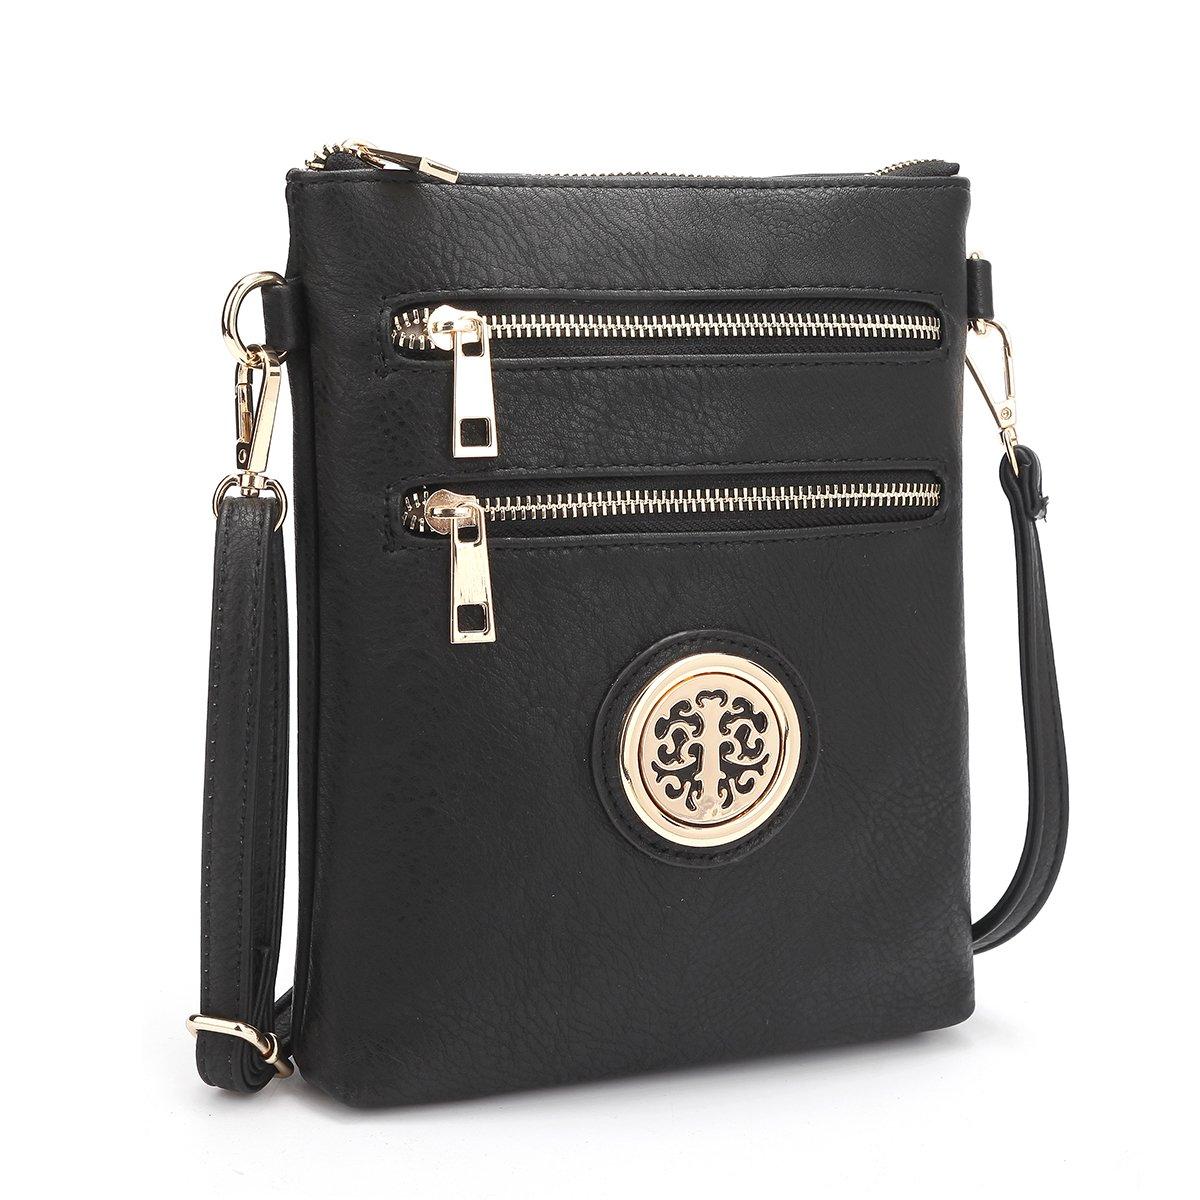 Dasein Small Crossbody Bag Multi Zipper Pockets Messenger Bag Lightweight Shoulder Bag Functional Purse